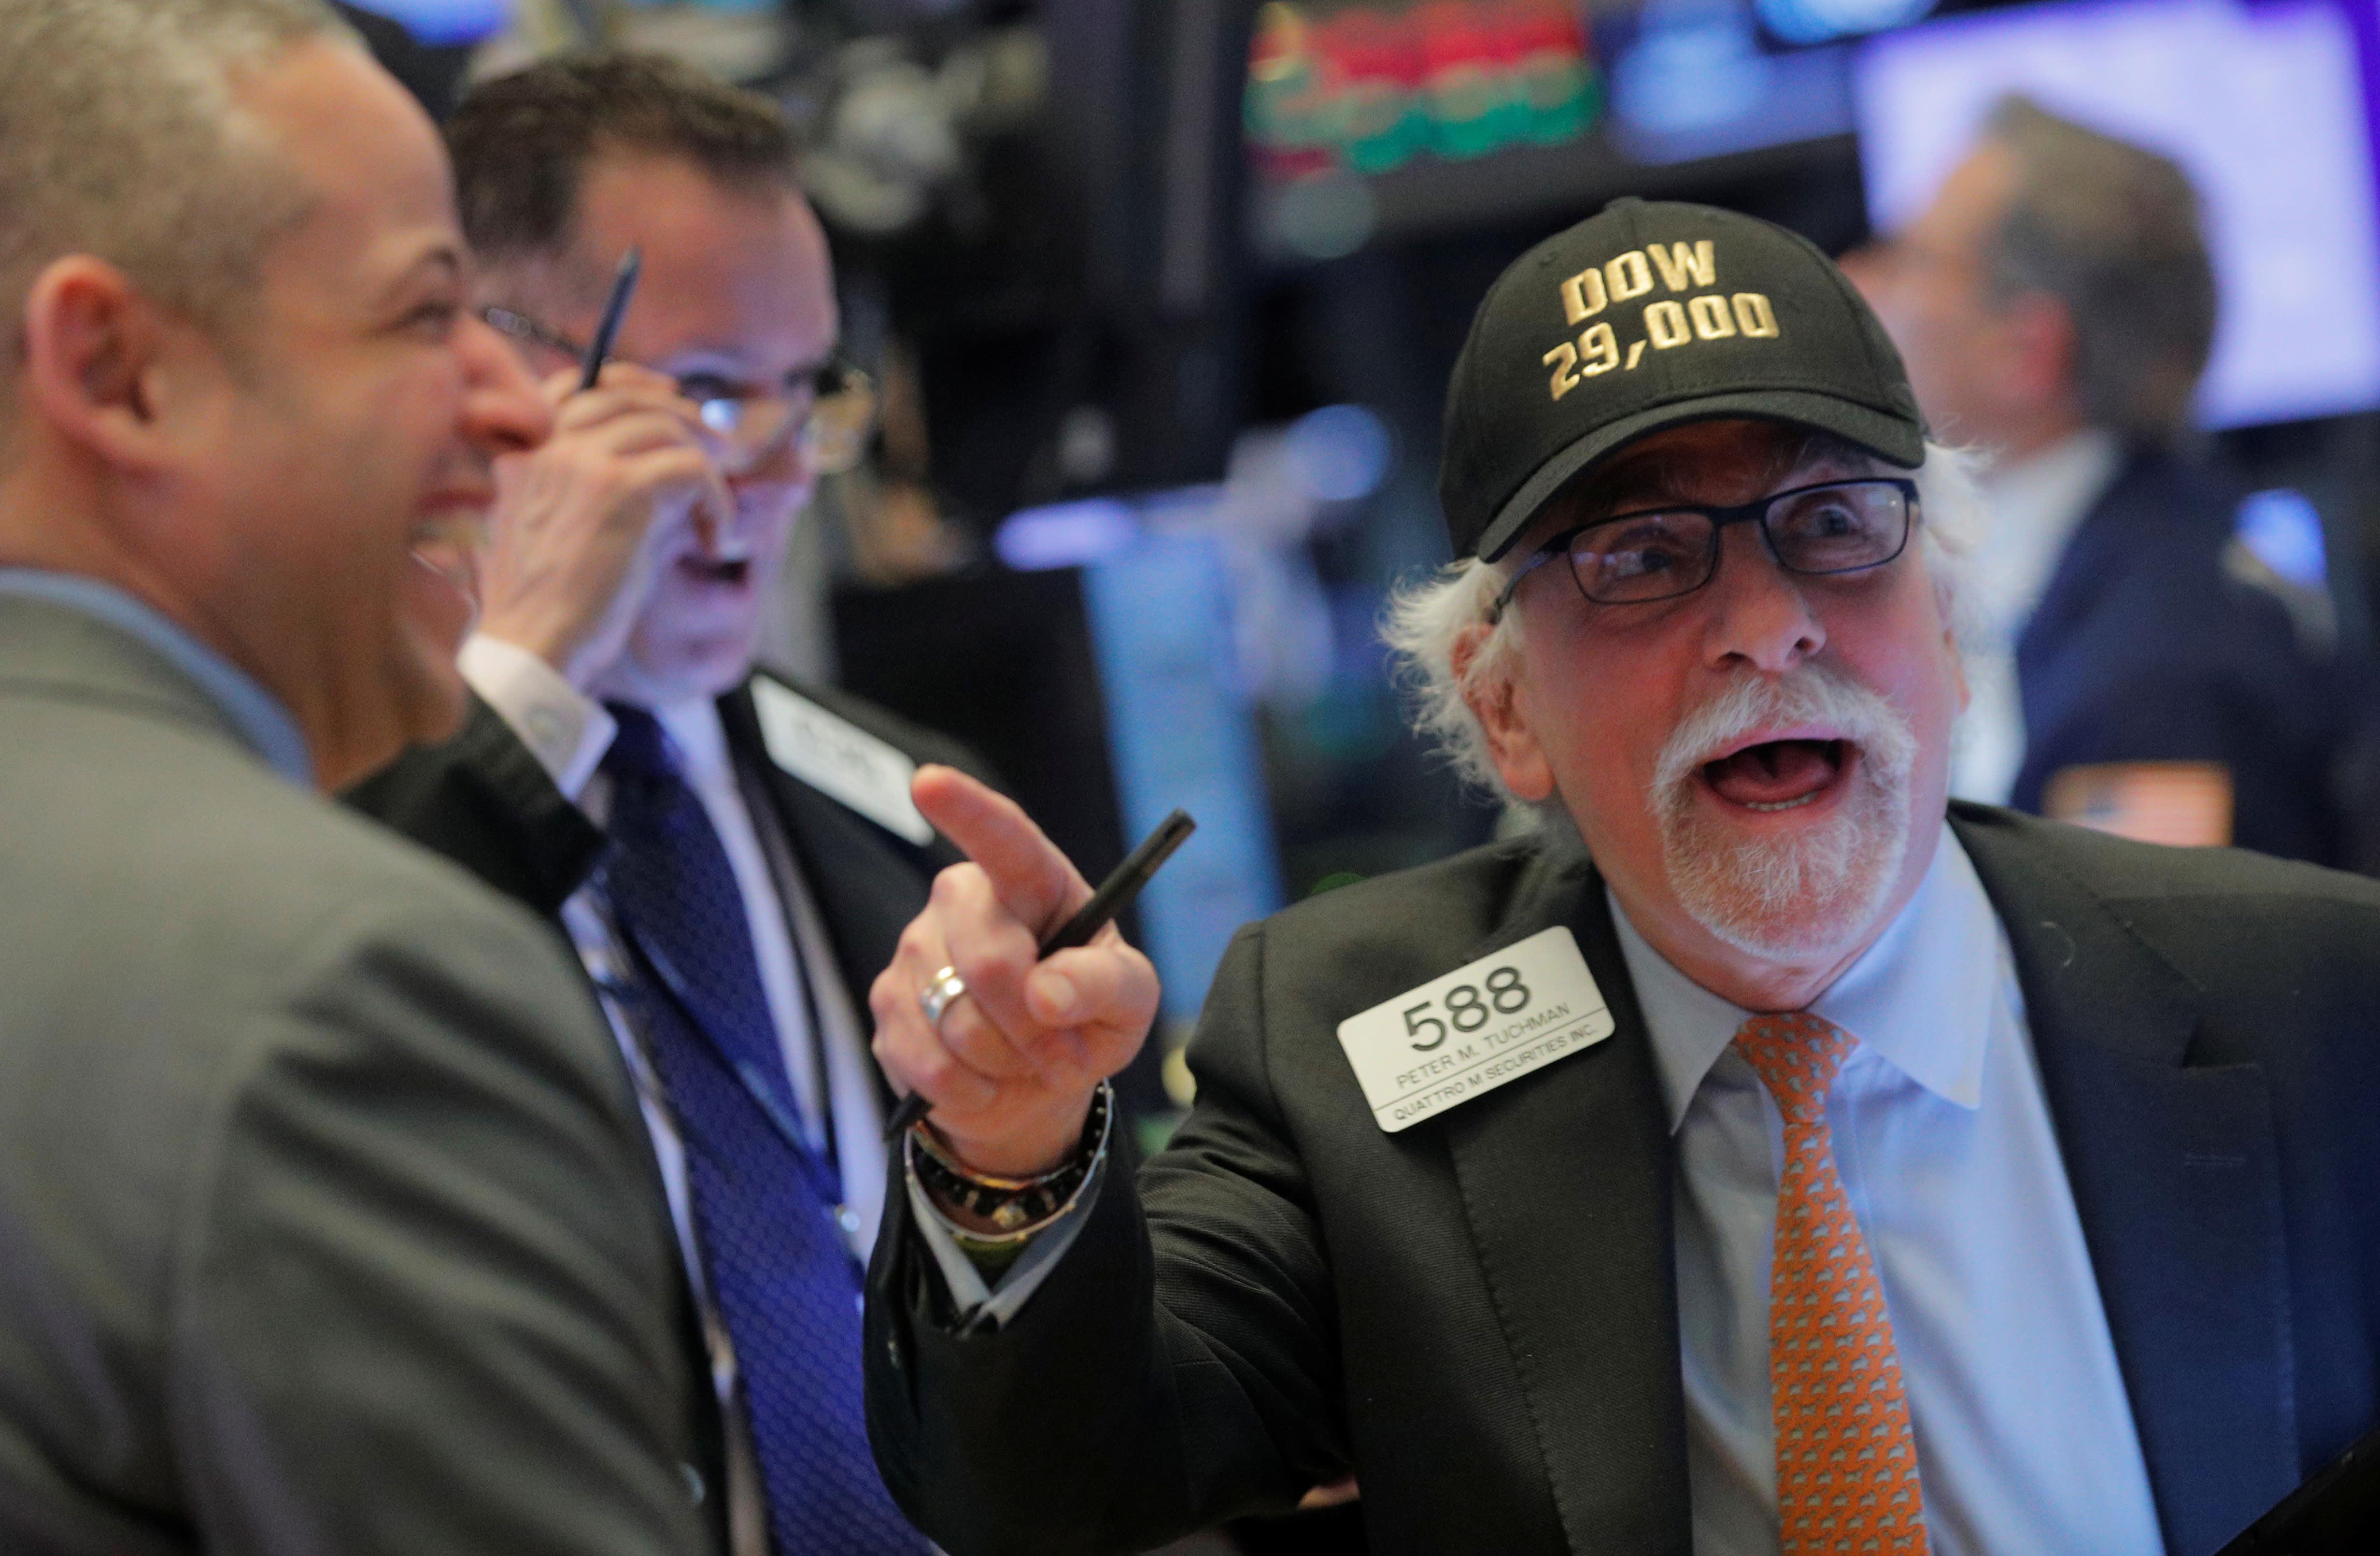 Live stock market updates: S&P 500 record, mystery housing move, coronavirus, chips jump